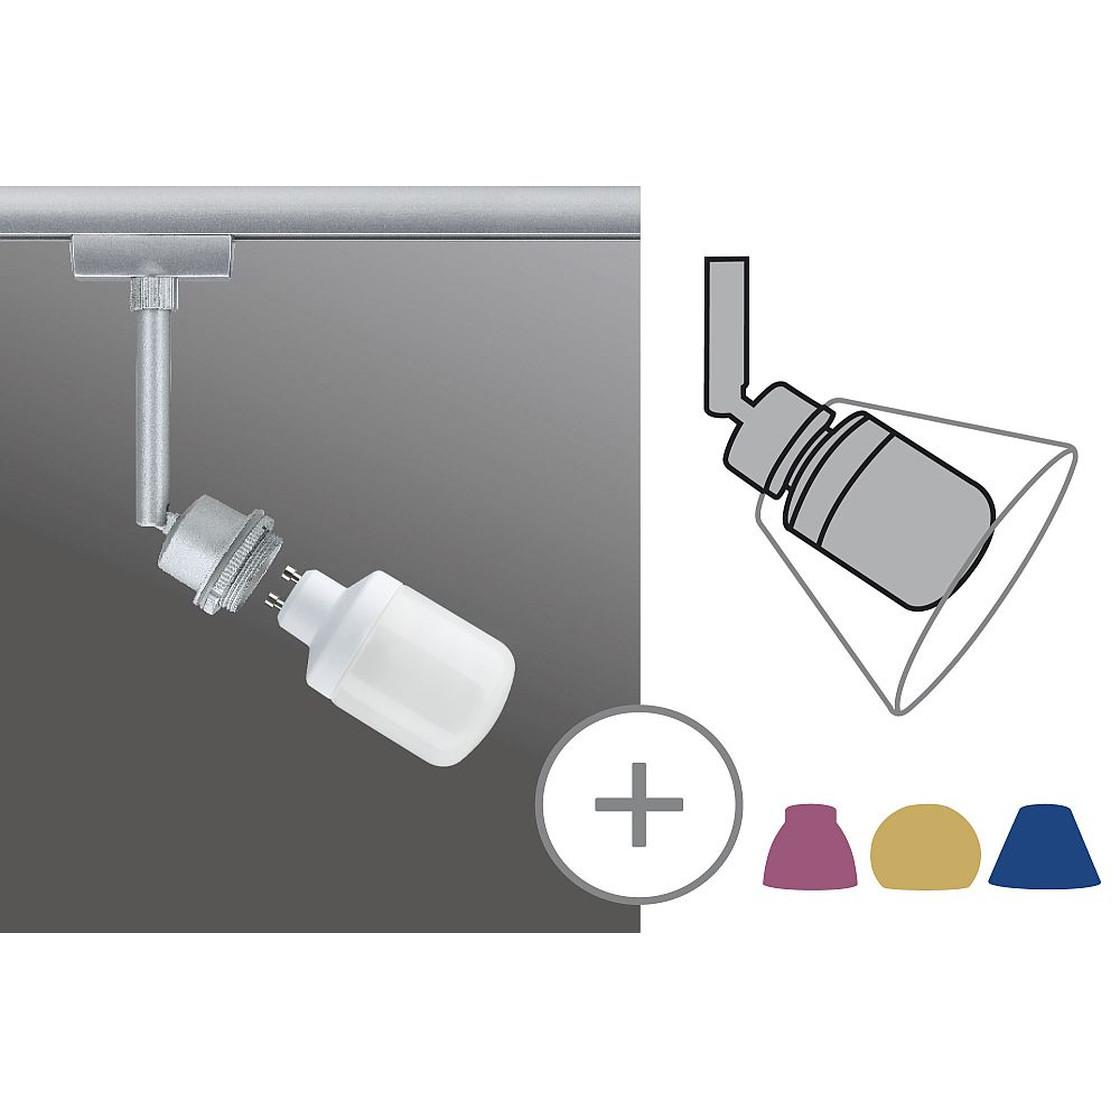 paulmann urail system deco spot 9w gu10 chrom matt inkl ener. Black Bedroom Furniture Sets. Home Design Ideas